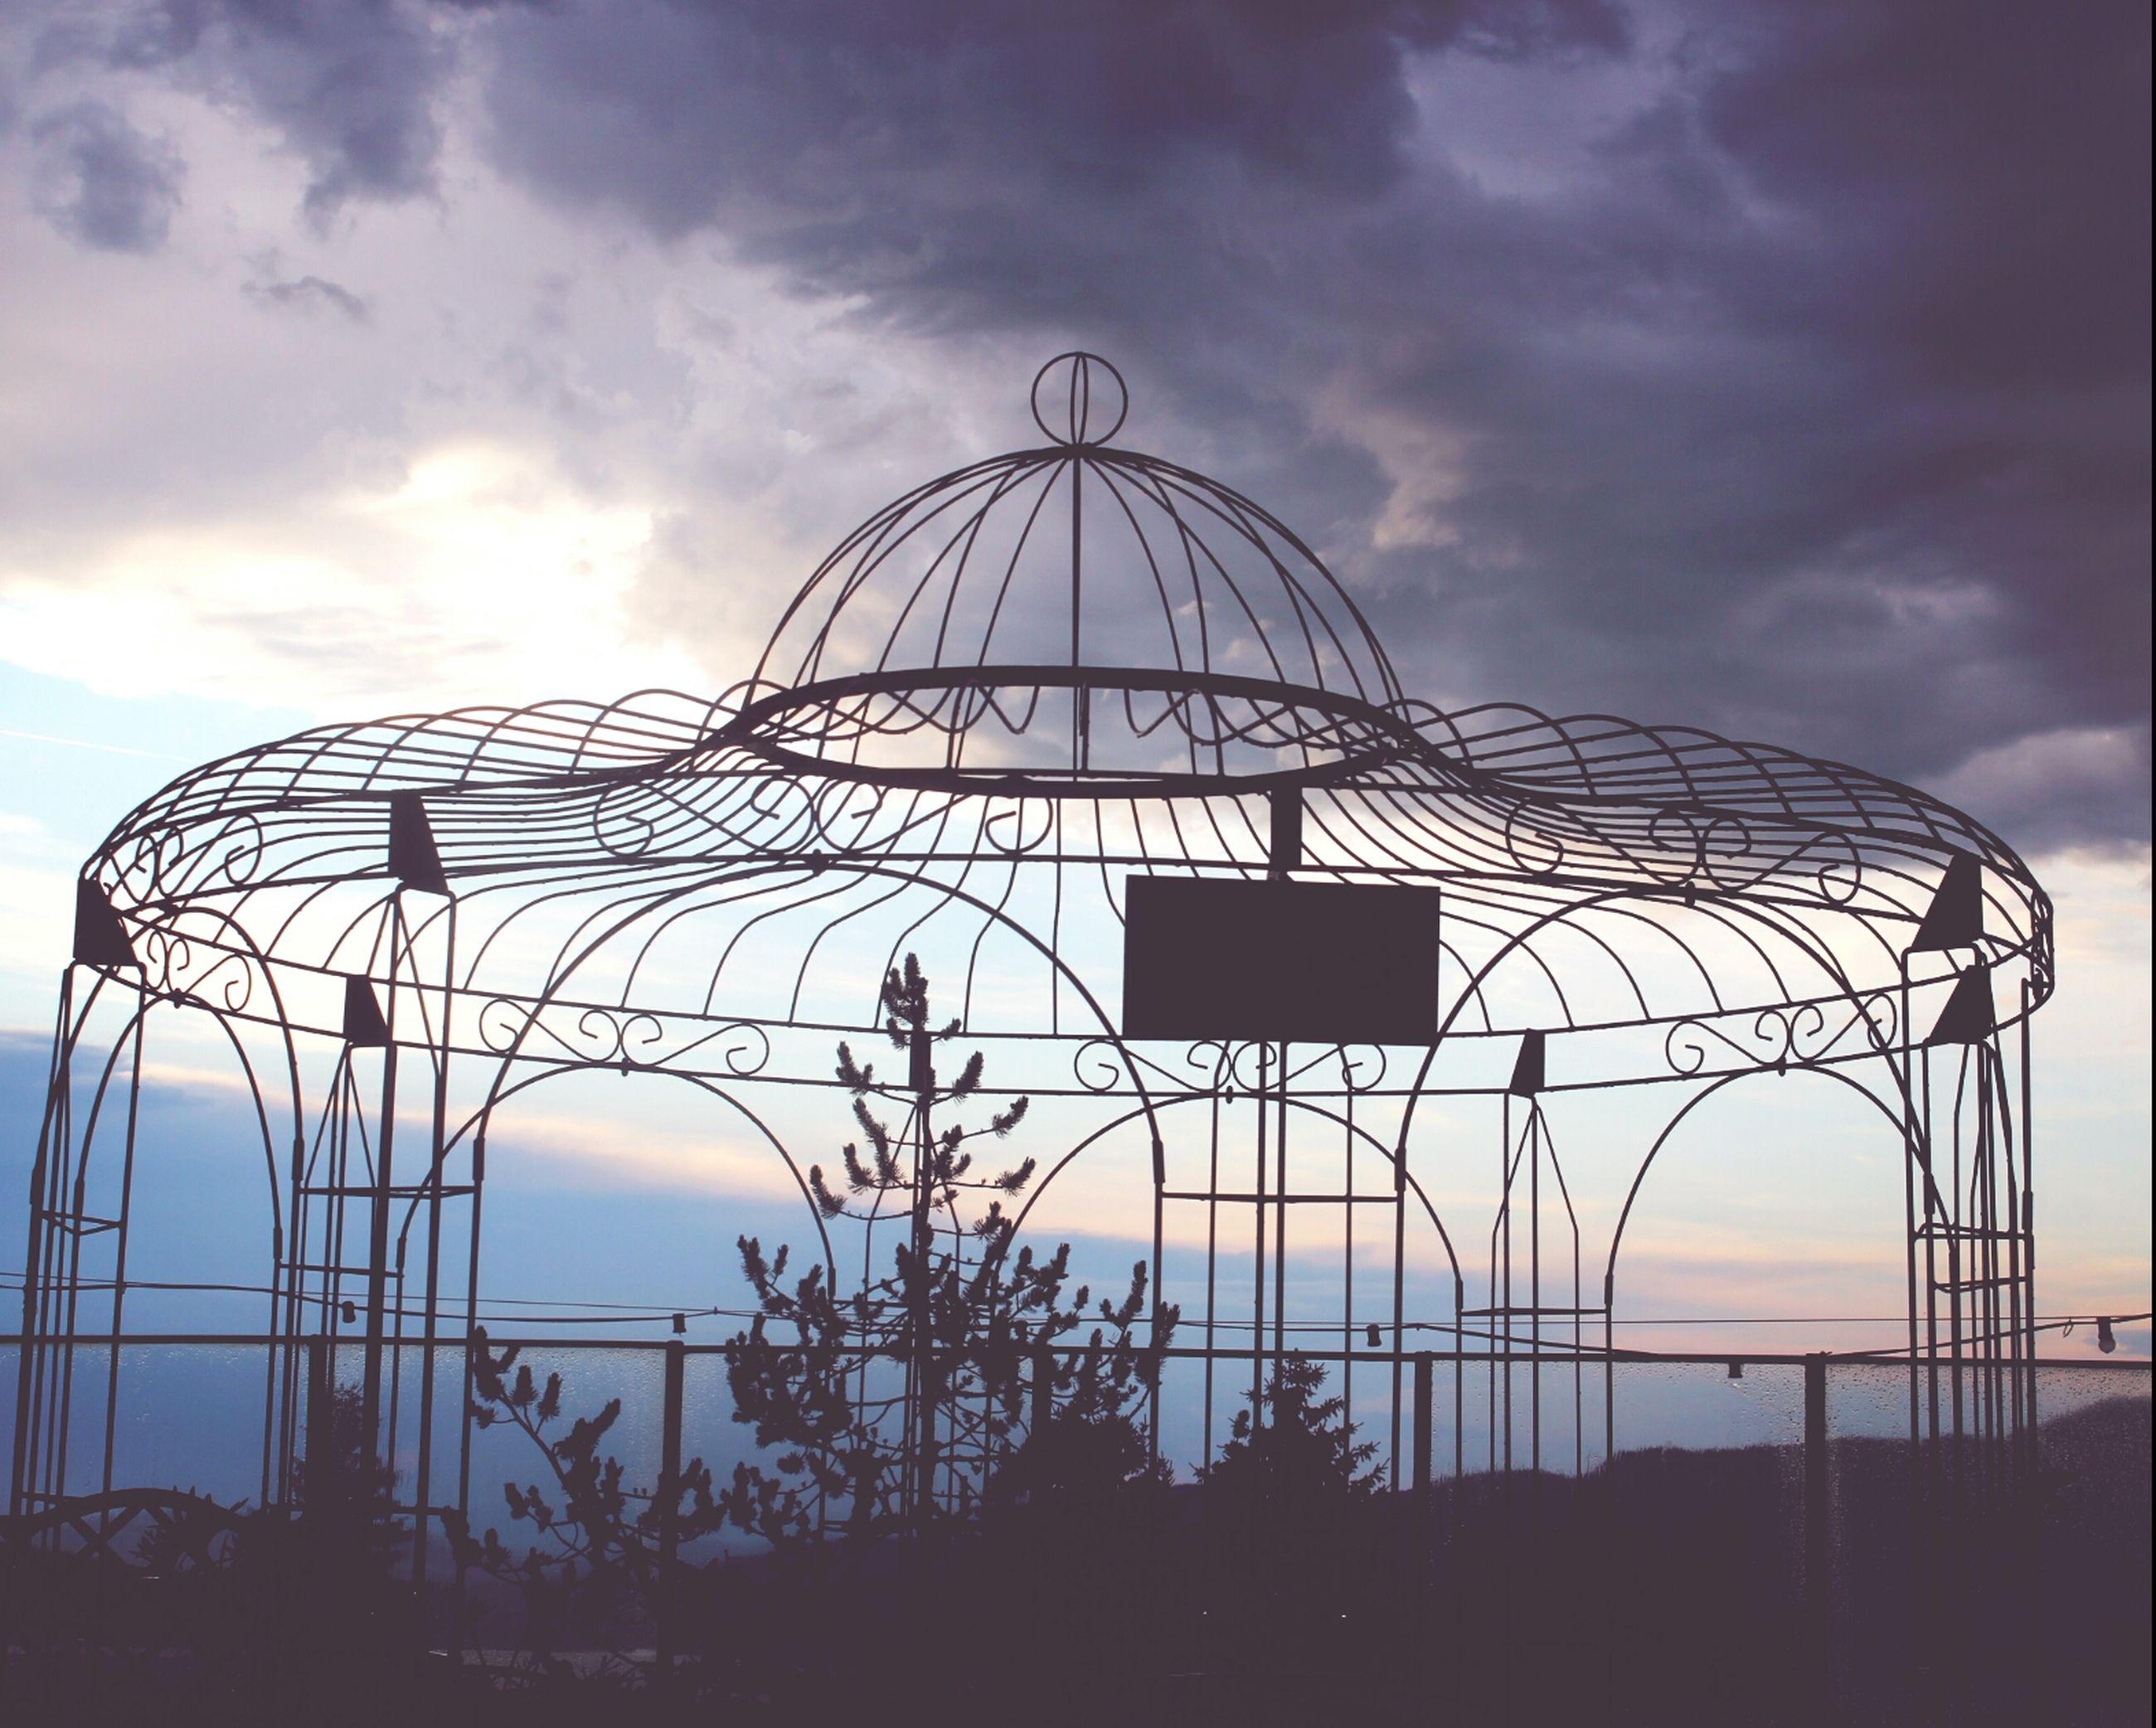 sky, low angle view, cloud - sky, cloudy, built structure, silhouette, cloud, amusement park, ferris wheel, amusement park ride, architecture, arts culture and entertainment, sunset, lighting equipment, dusk, outdoors, circle, no people, metal, building exterior